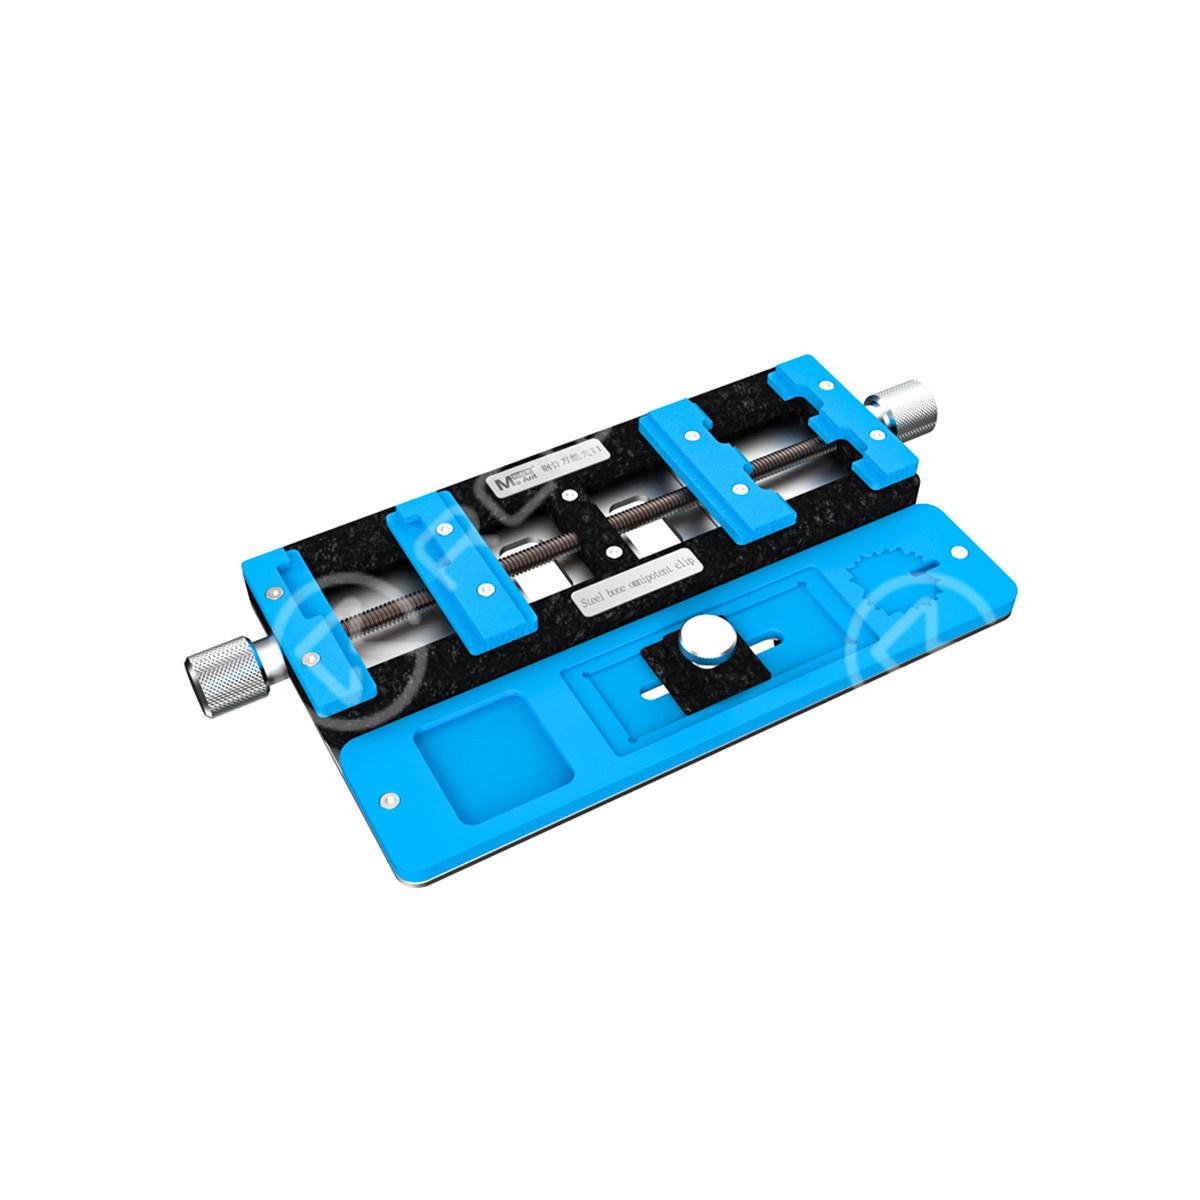 MaAnt T1 Universal PCB Holder for Soldering Repair